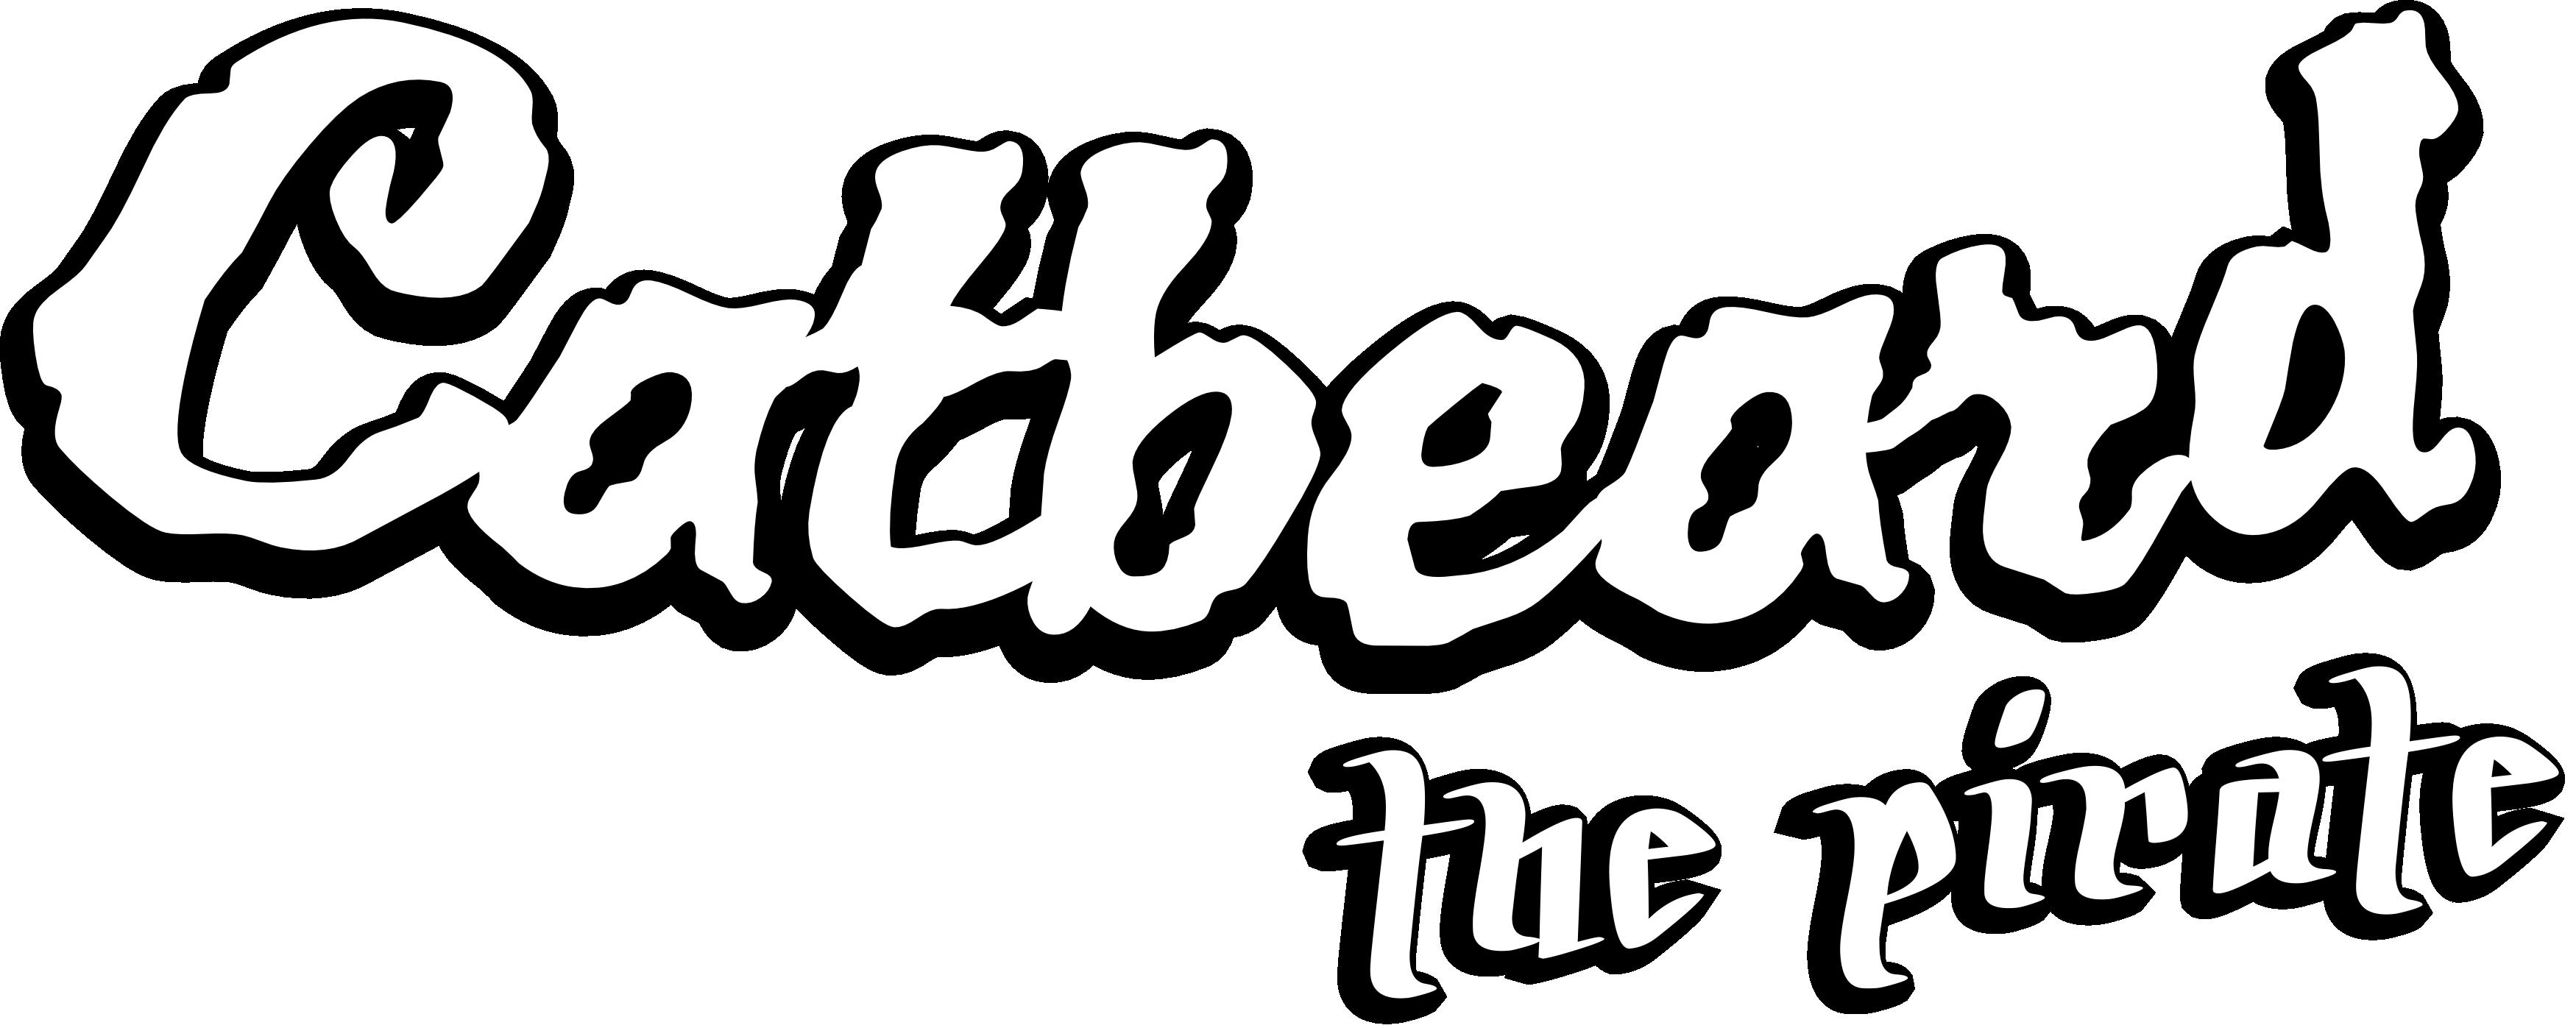 catbeard_logo.png